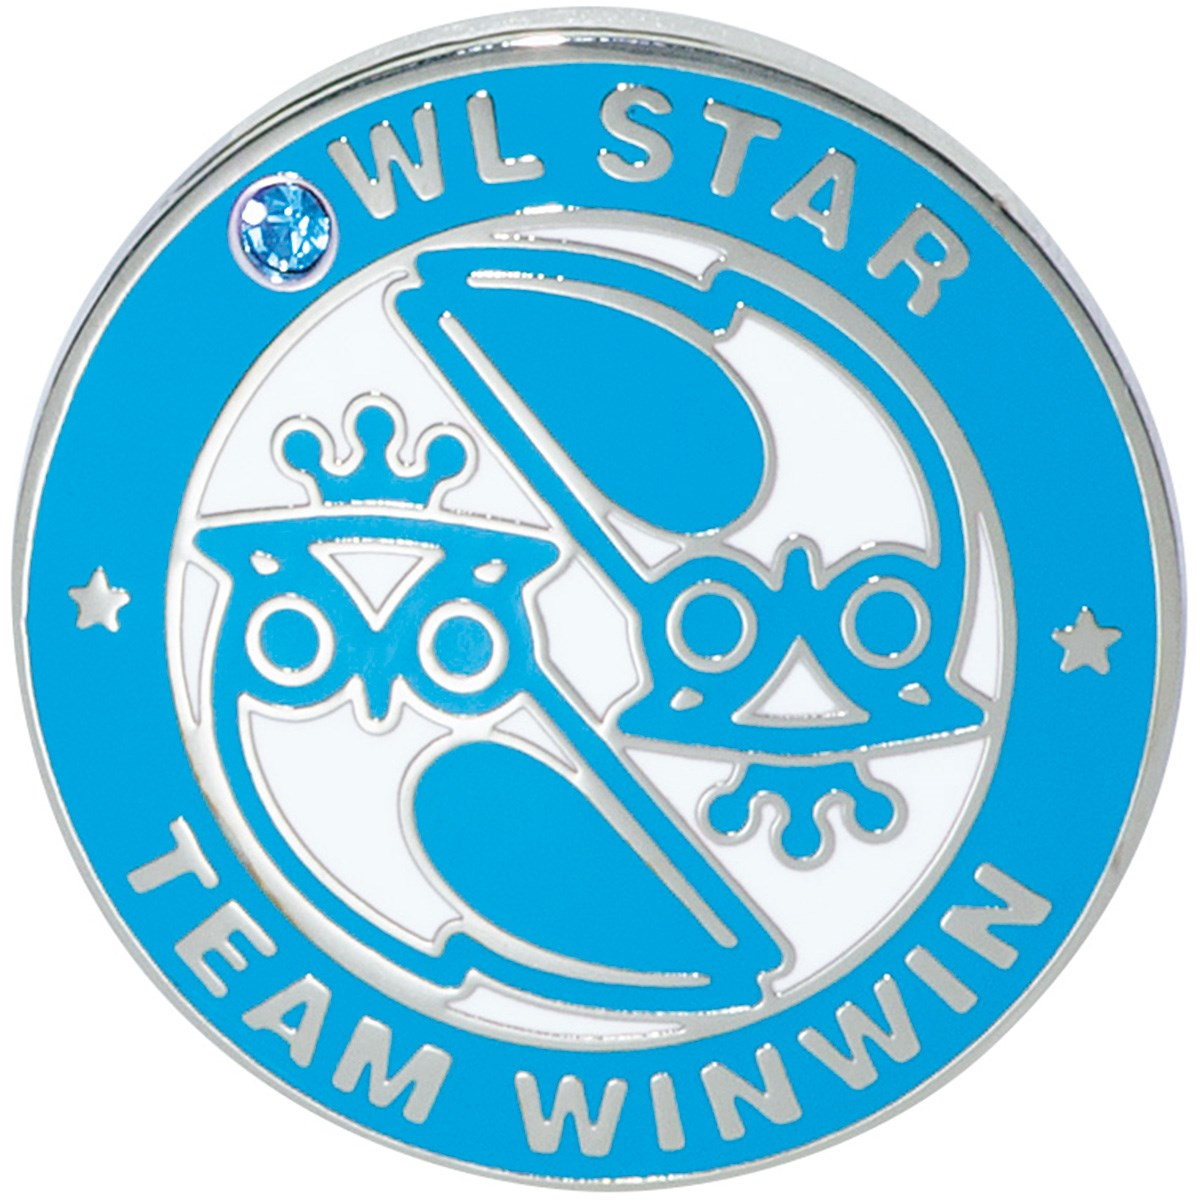 WINWIN STYLE OWL STAR マーカー